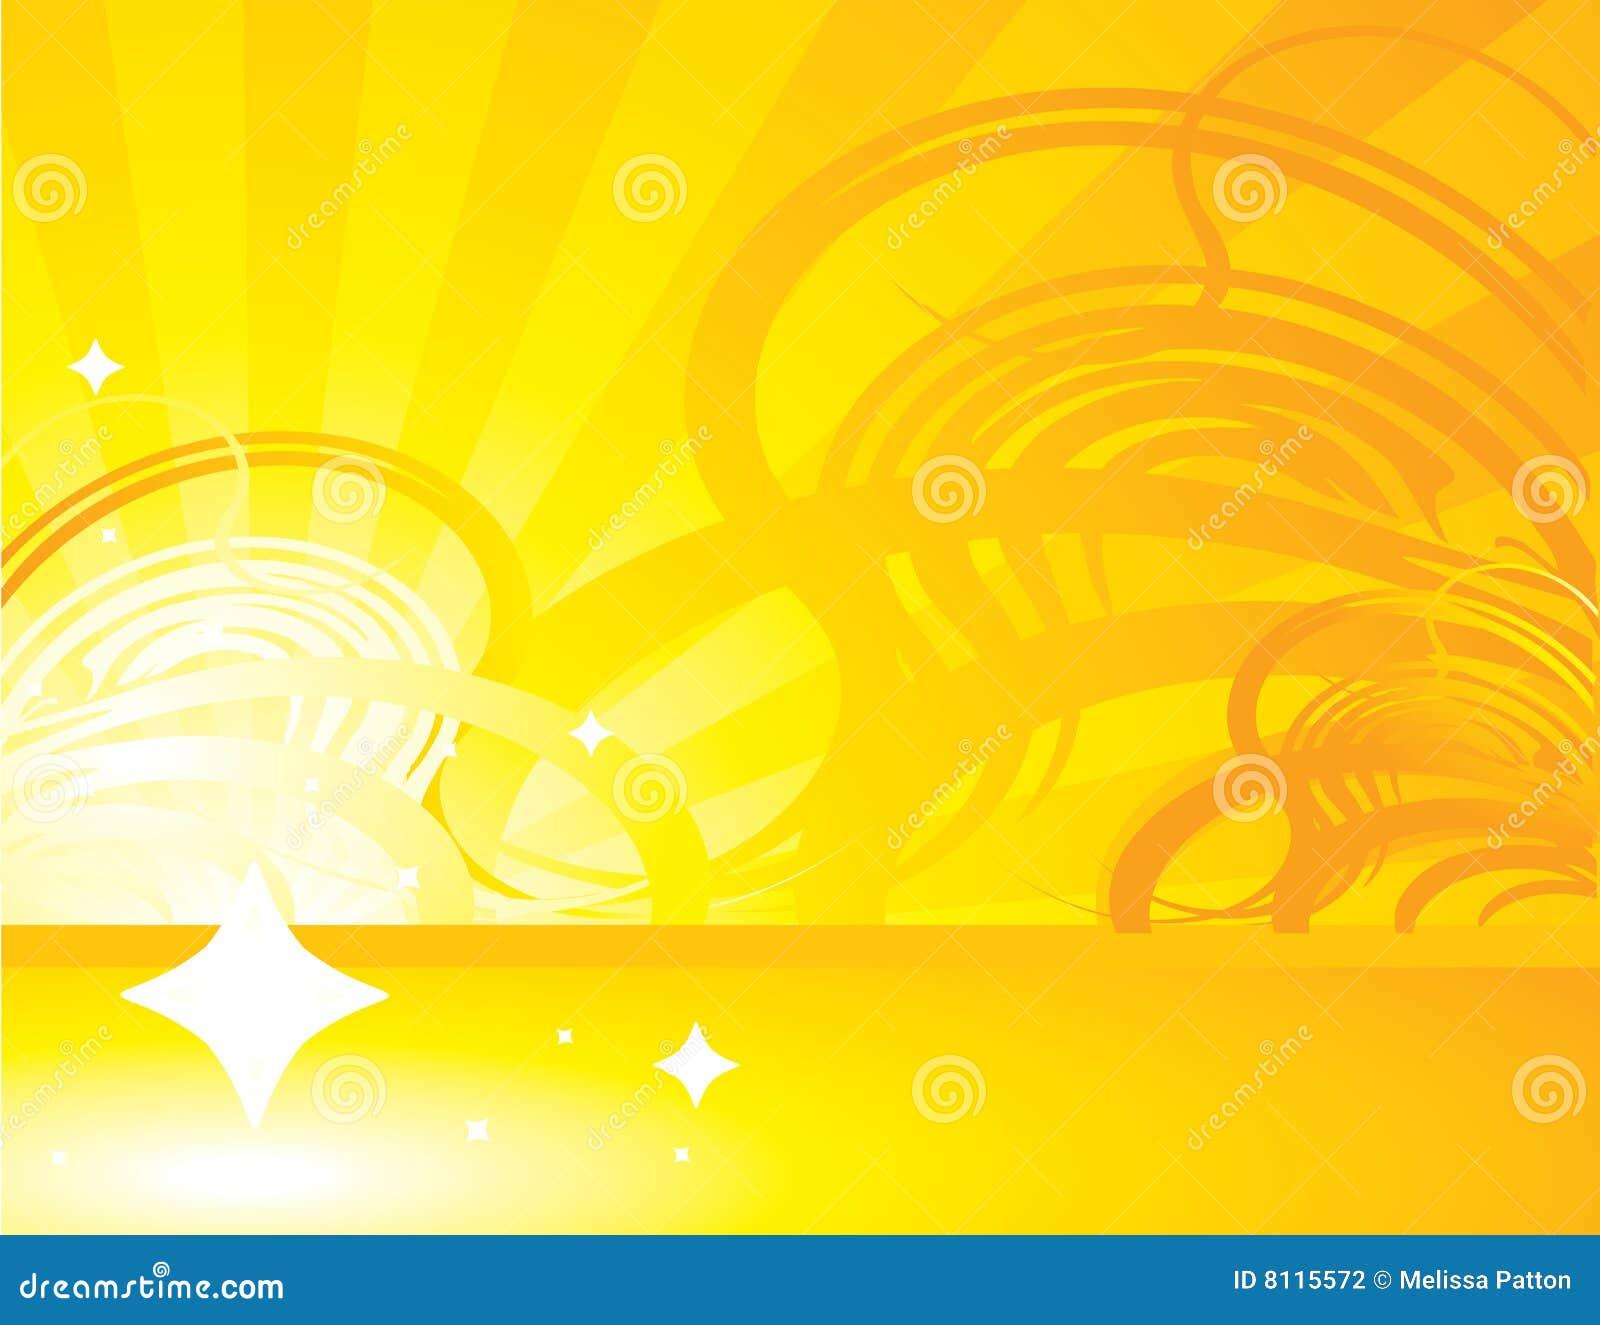 Fondo abstracto amarillo naranja 1 del rayo fotograf a de - Amarillo naranja ...